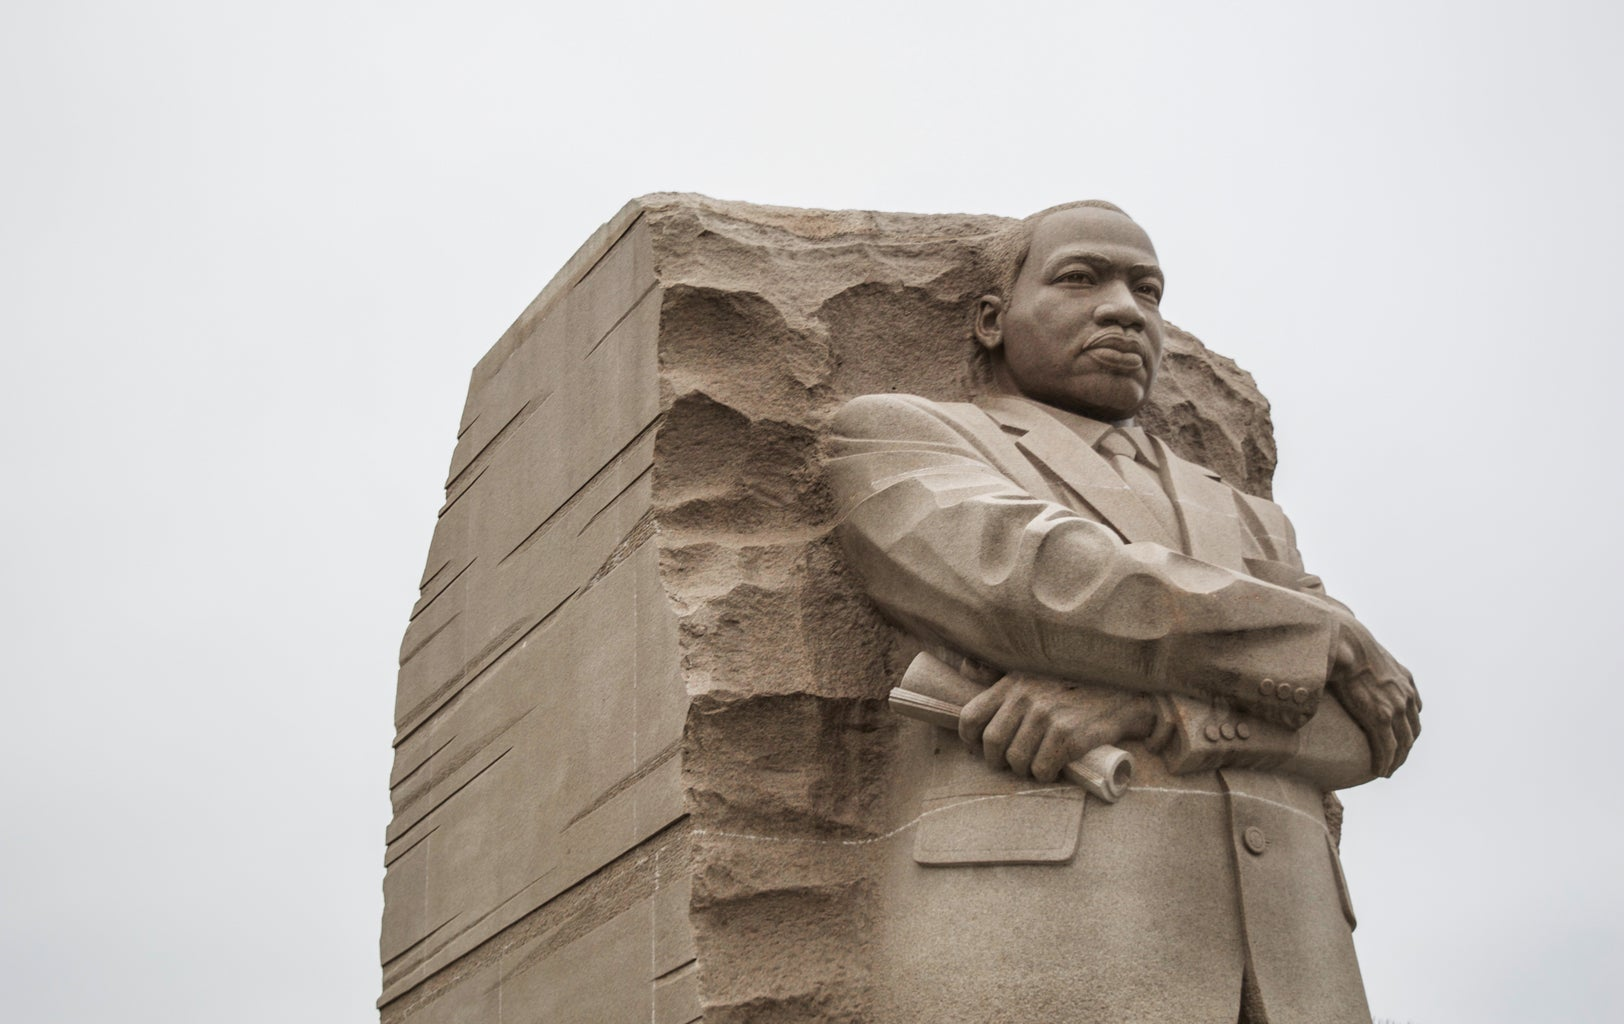 MLK statue in D.C.